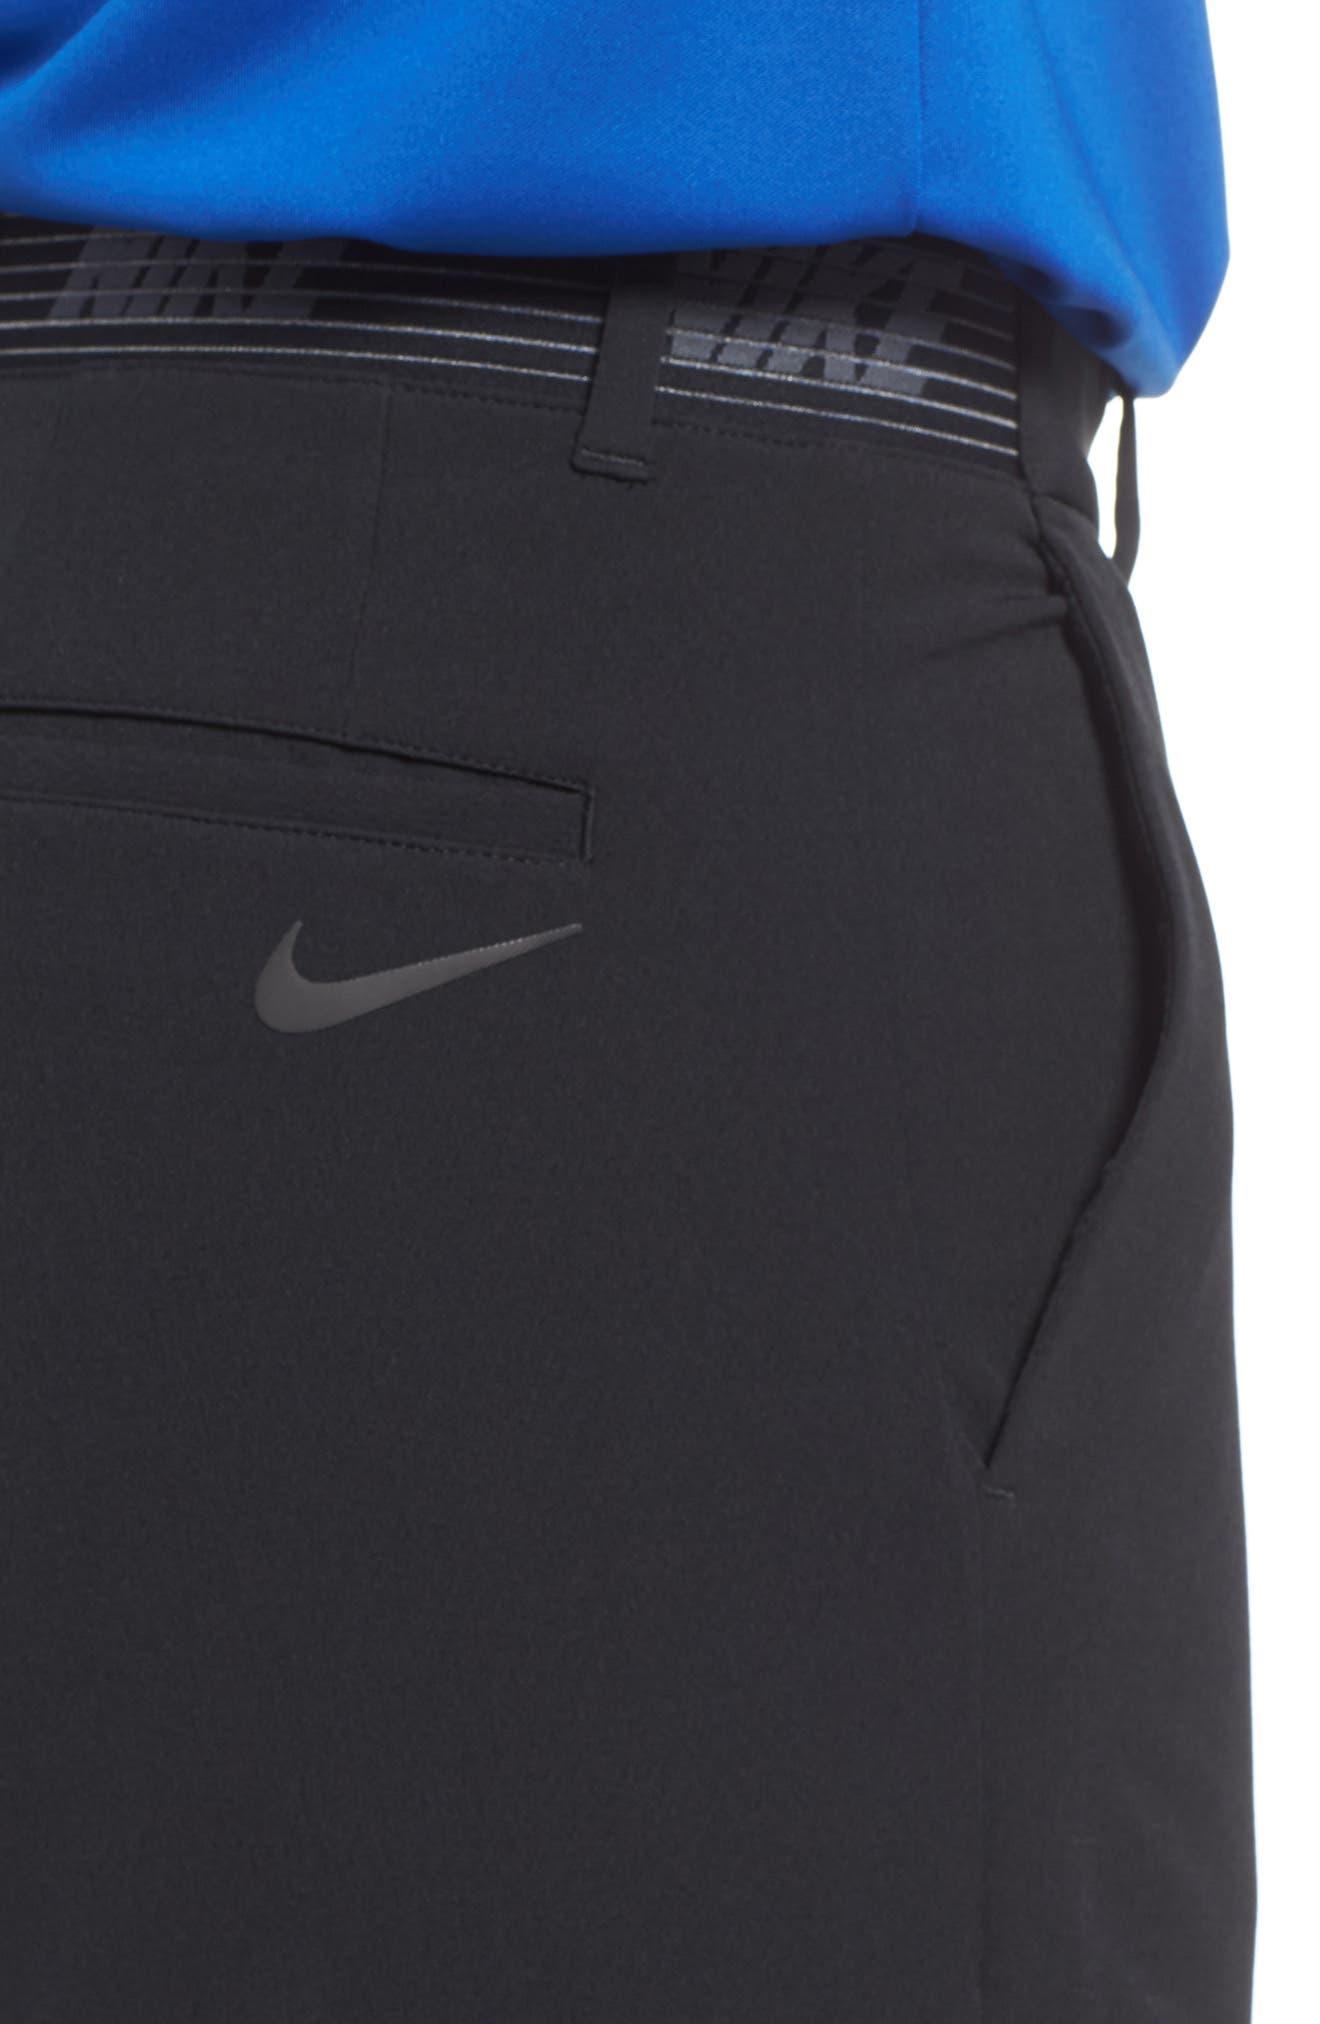 Dry Flex Slim Fit Golf Shorts,                             Alternate thumbnail 4, color,                             Black/ Black